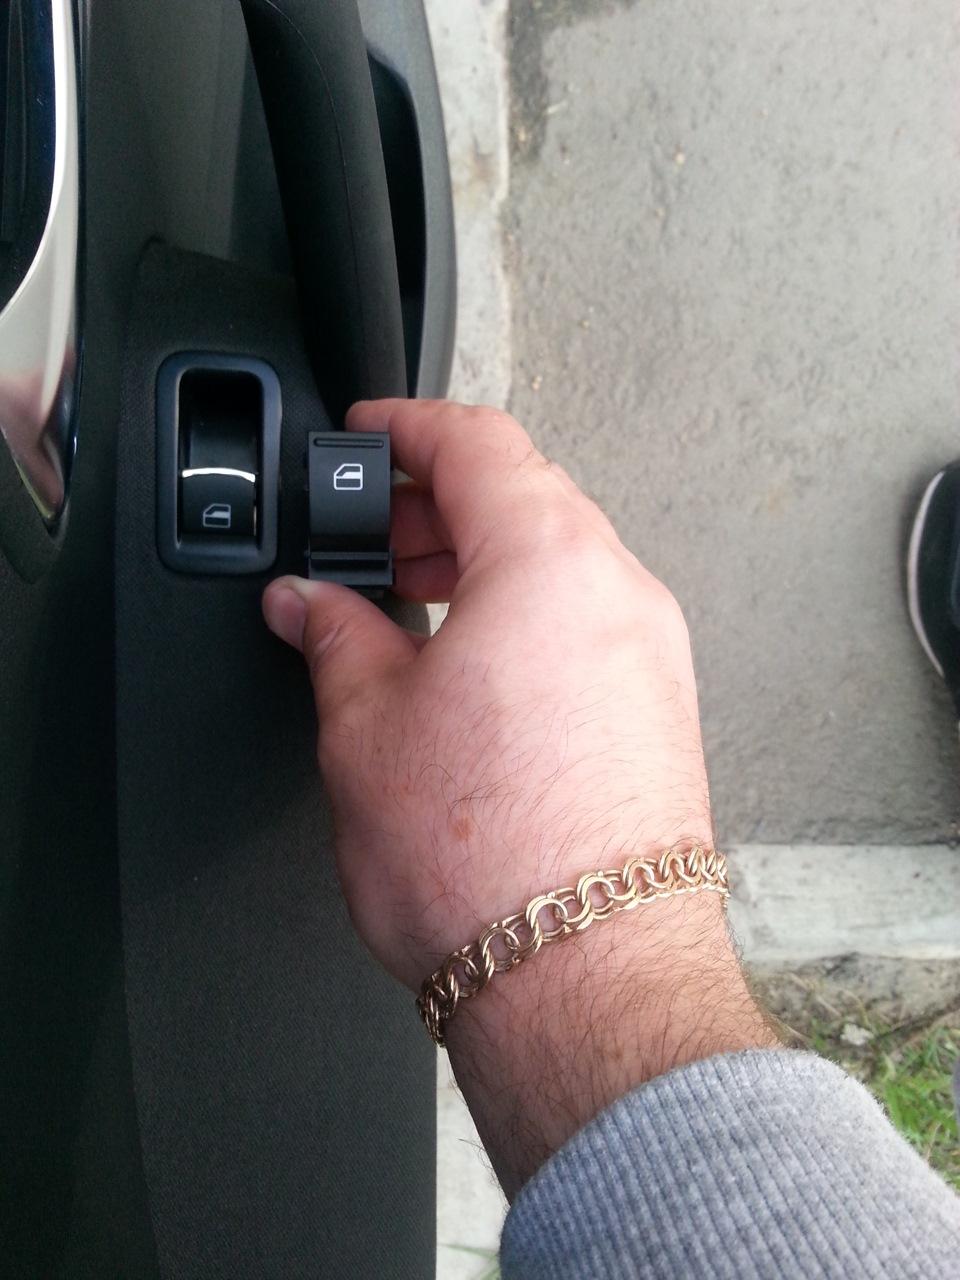 снять кнопку стеклоподъемника на volkswagen polo